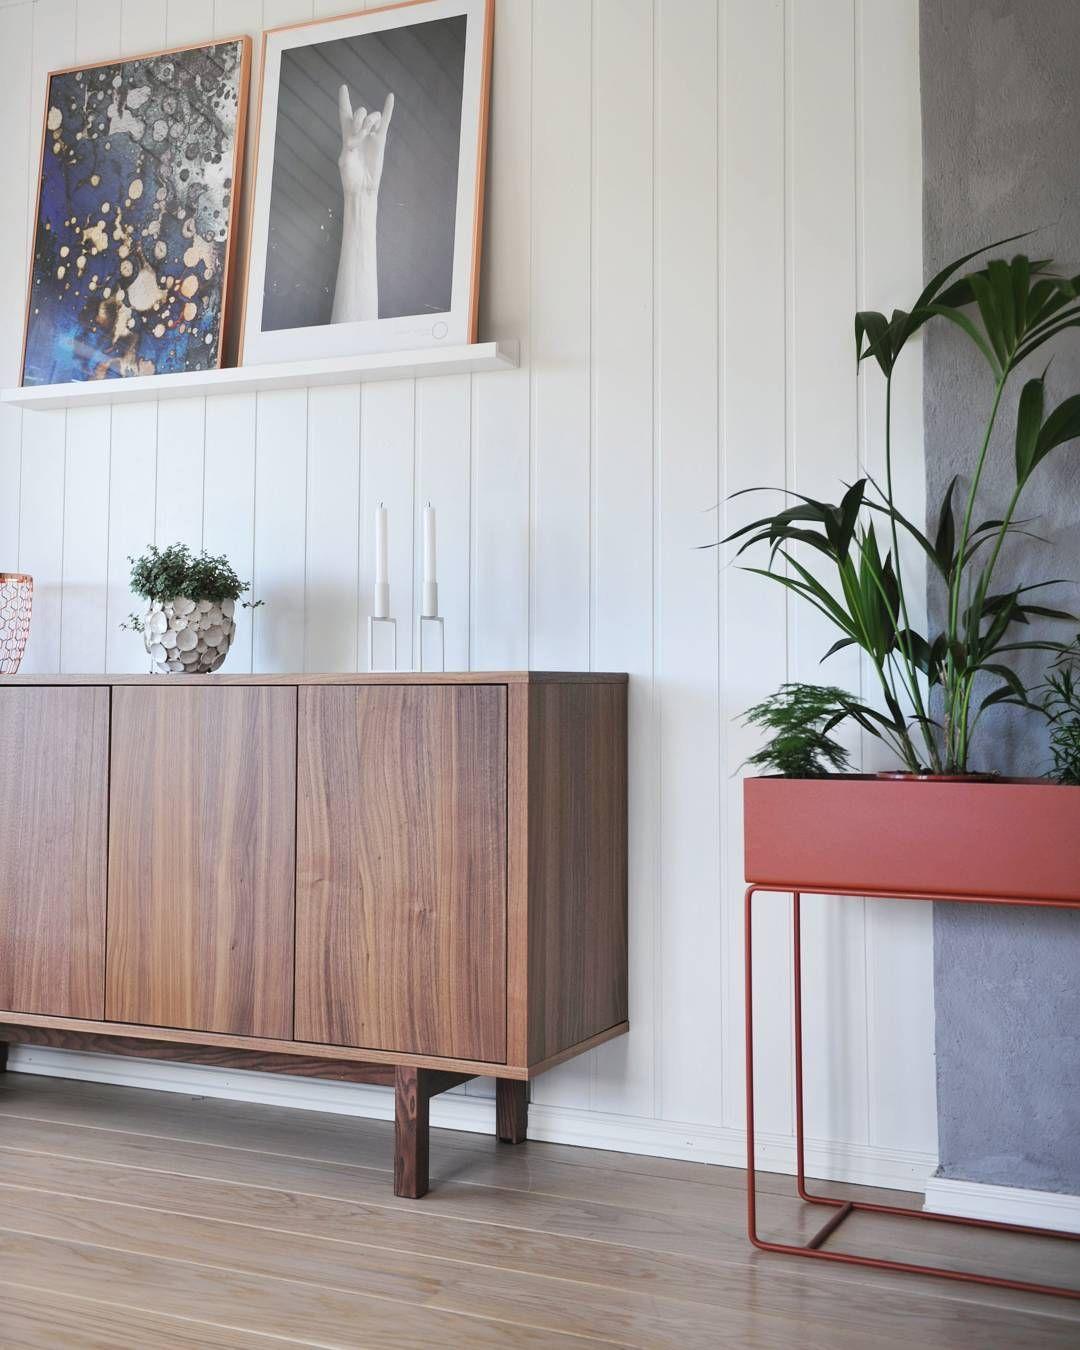 Ikea Uk Living Room Furniture: Ikea 'Stockholm' Sideboard